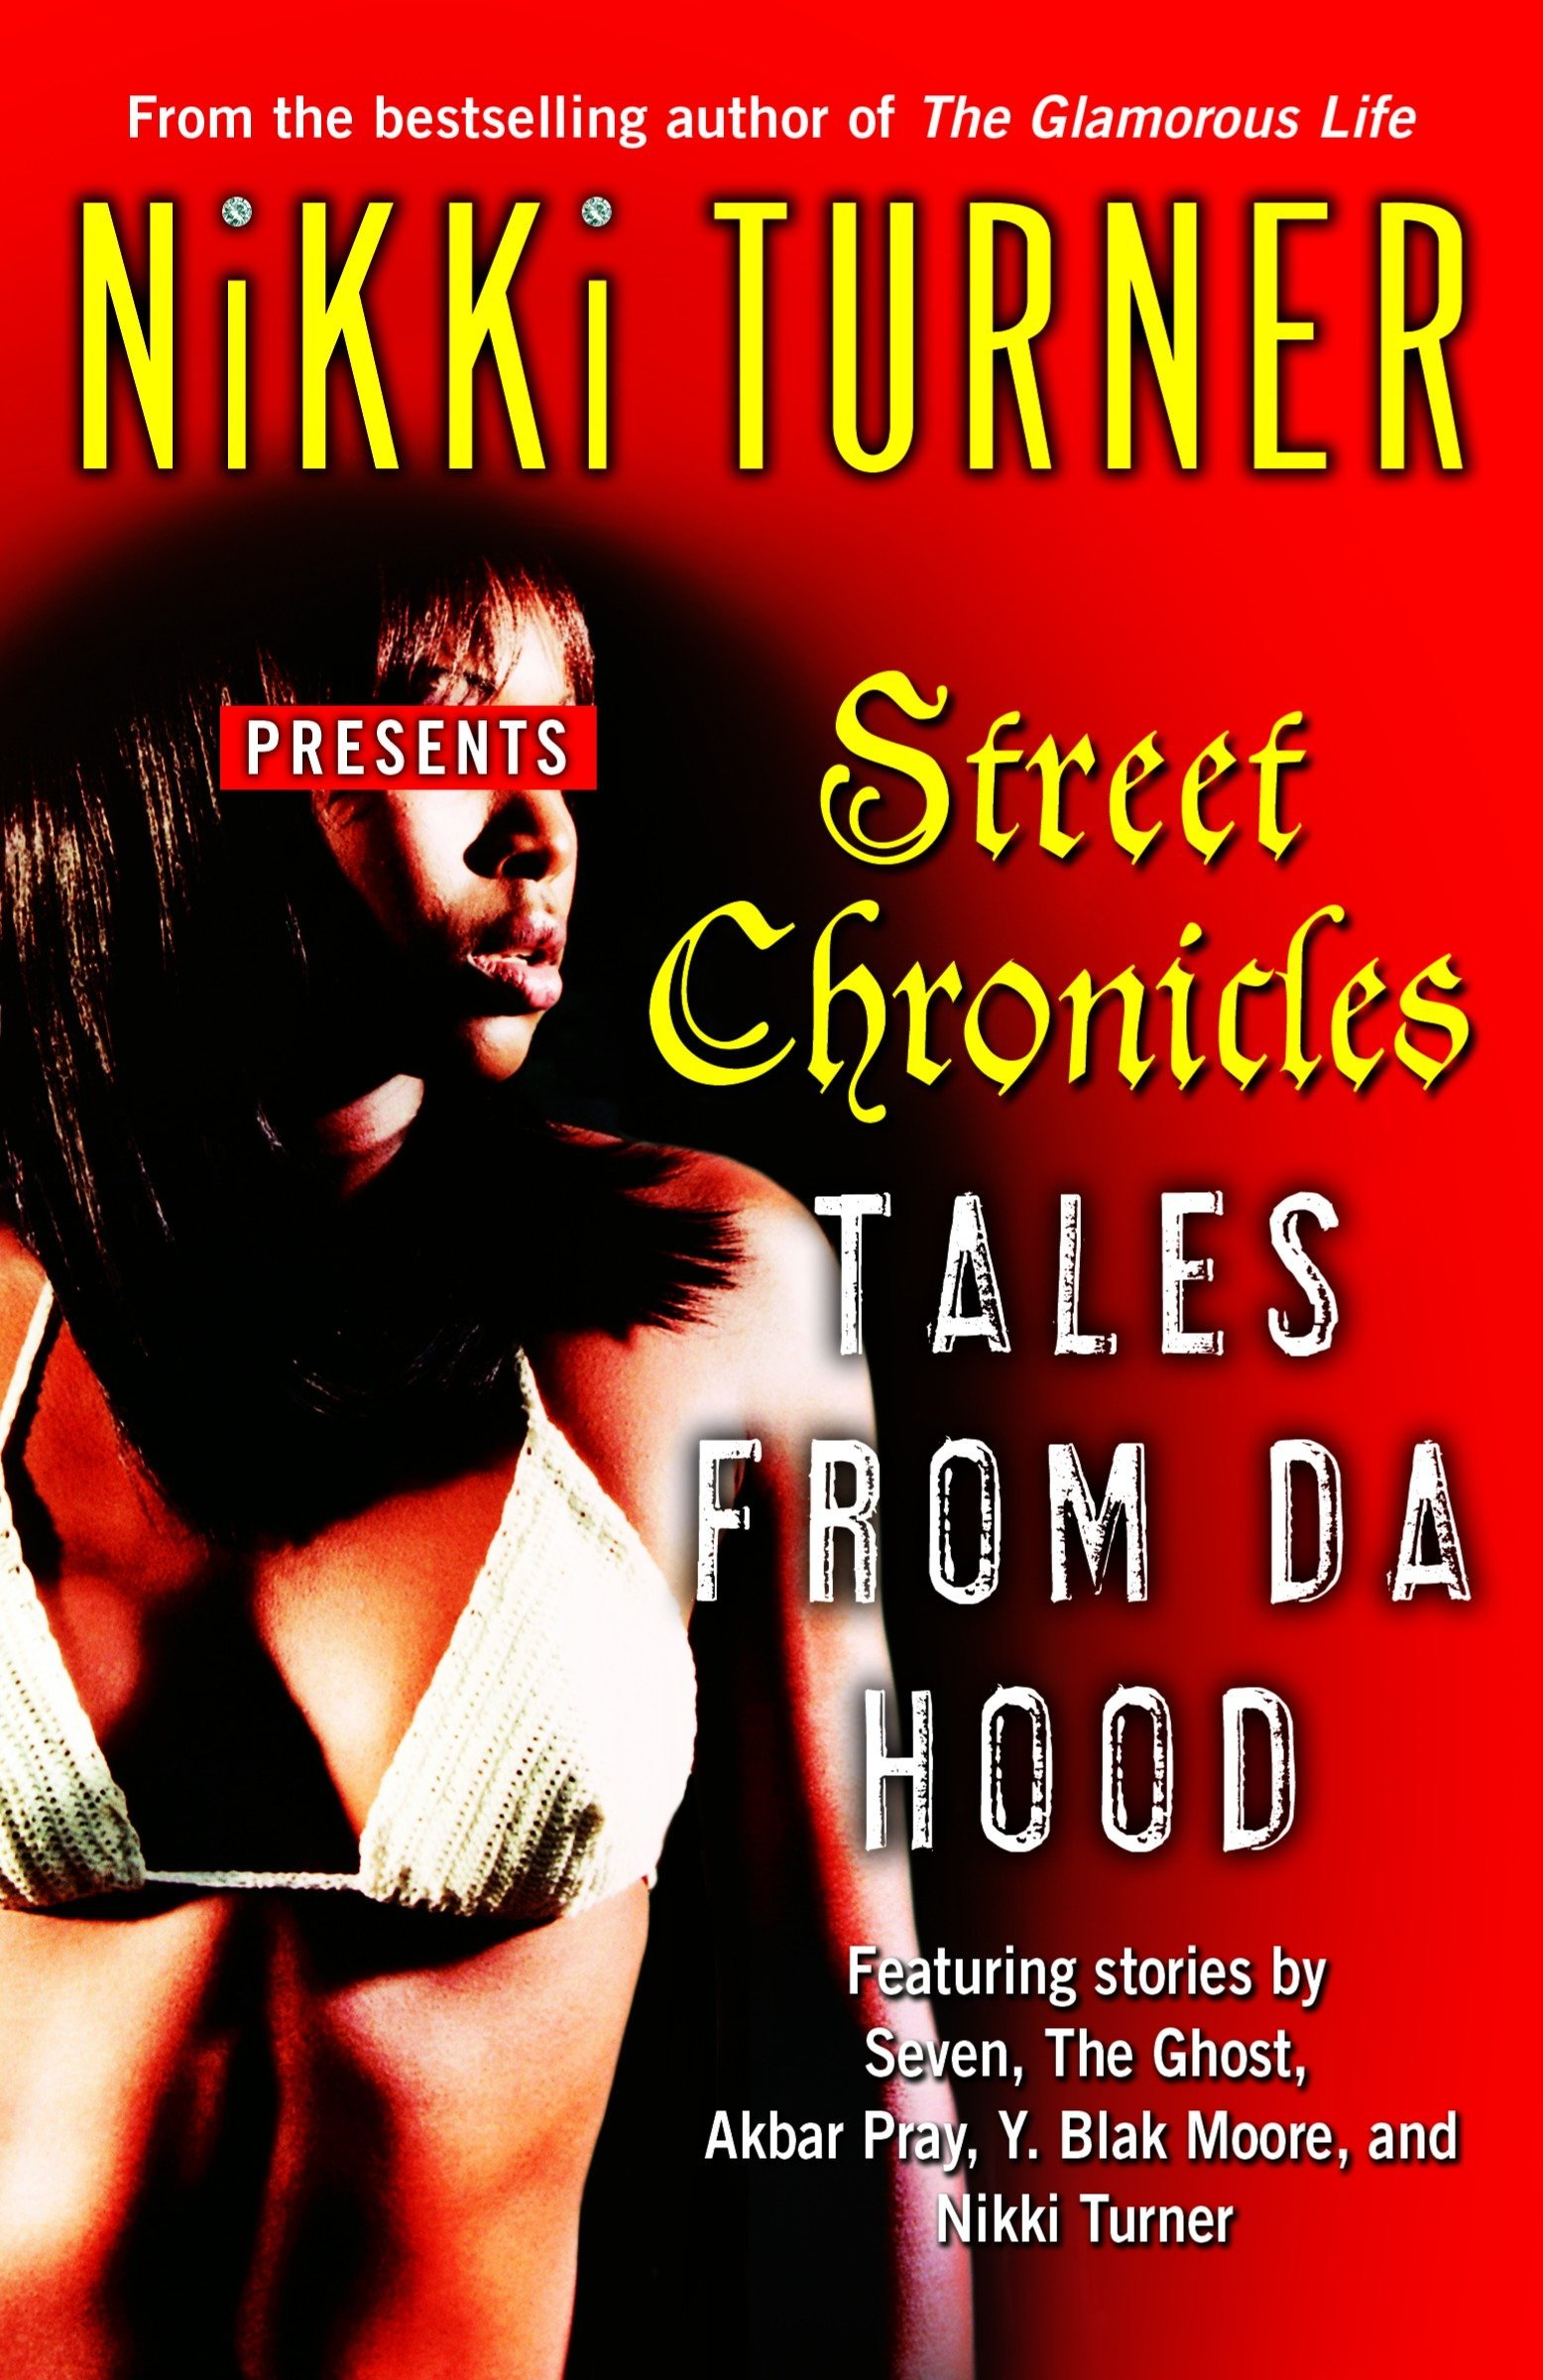 Amazon.com: Tales from da Hood: Stories (9780345484017): Nikki Turner: Books